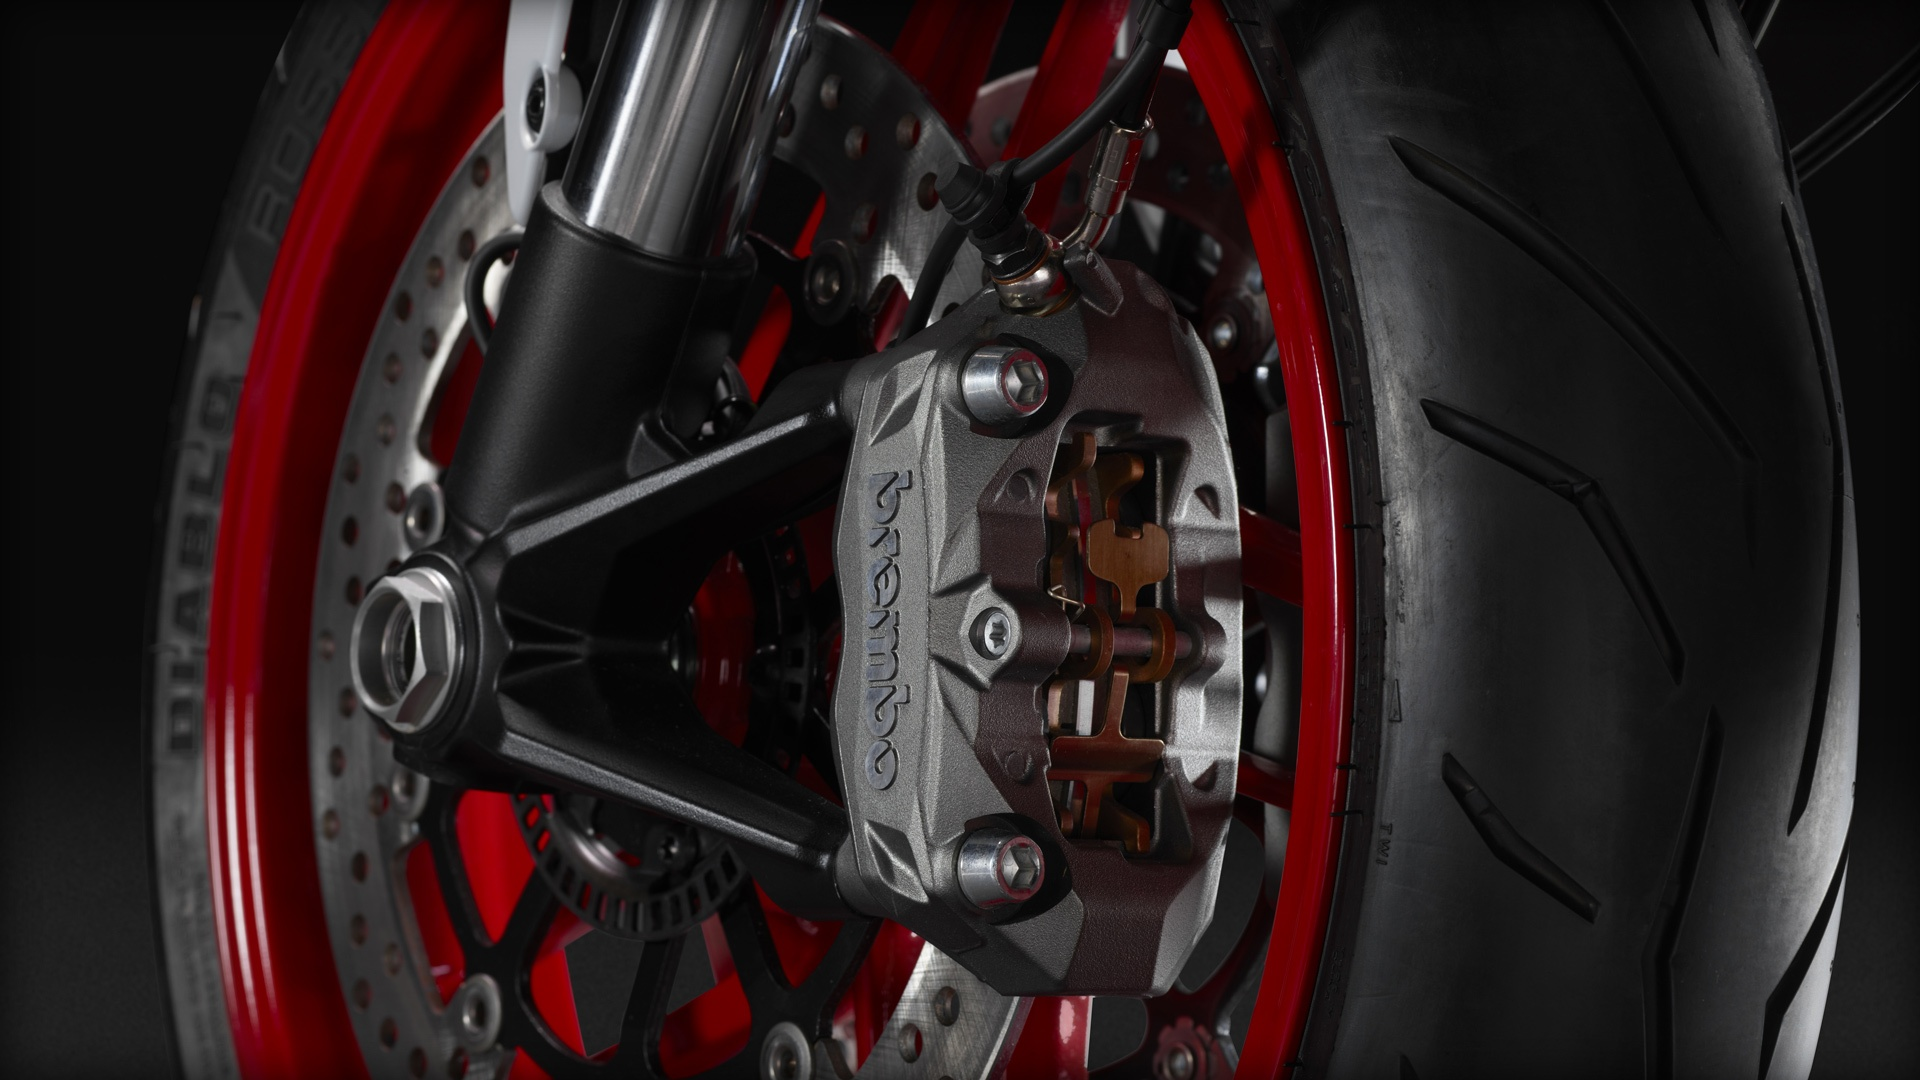 МОТОЦИКЛ DUCATI MONSTER 797+  Артмото - купить квадроцикл в украине и харькове, мотоцикл, снегоход, скутер, мопед, электромобиль